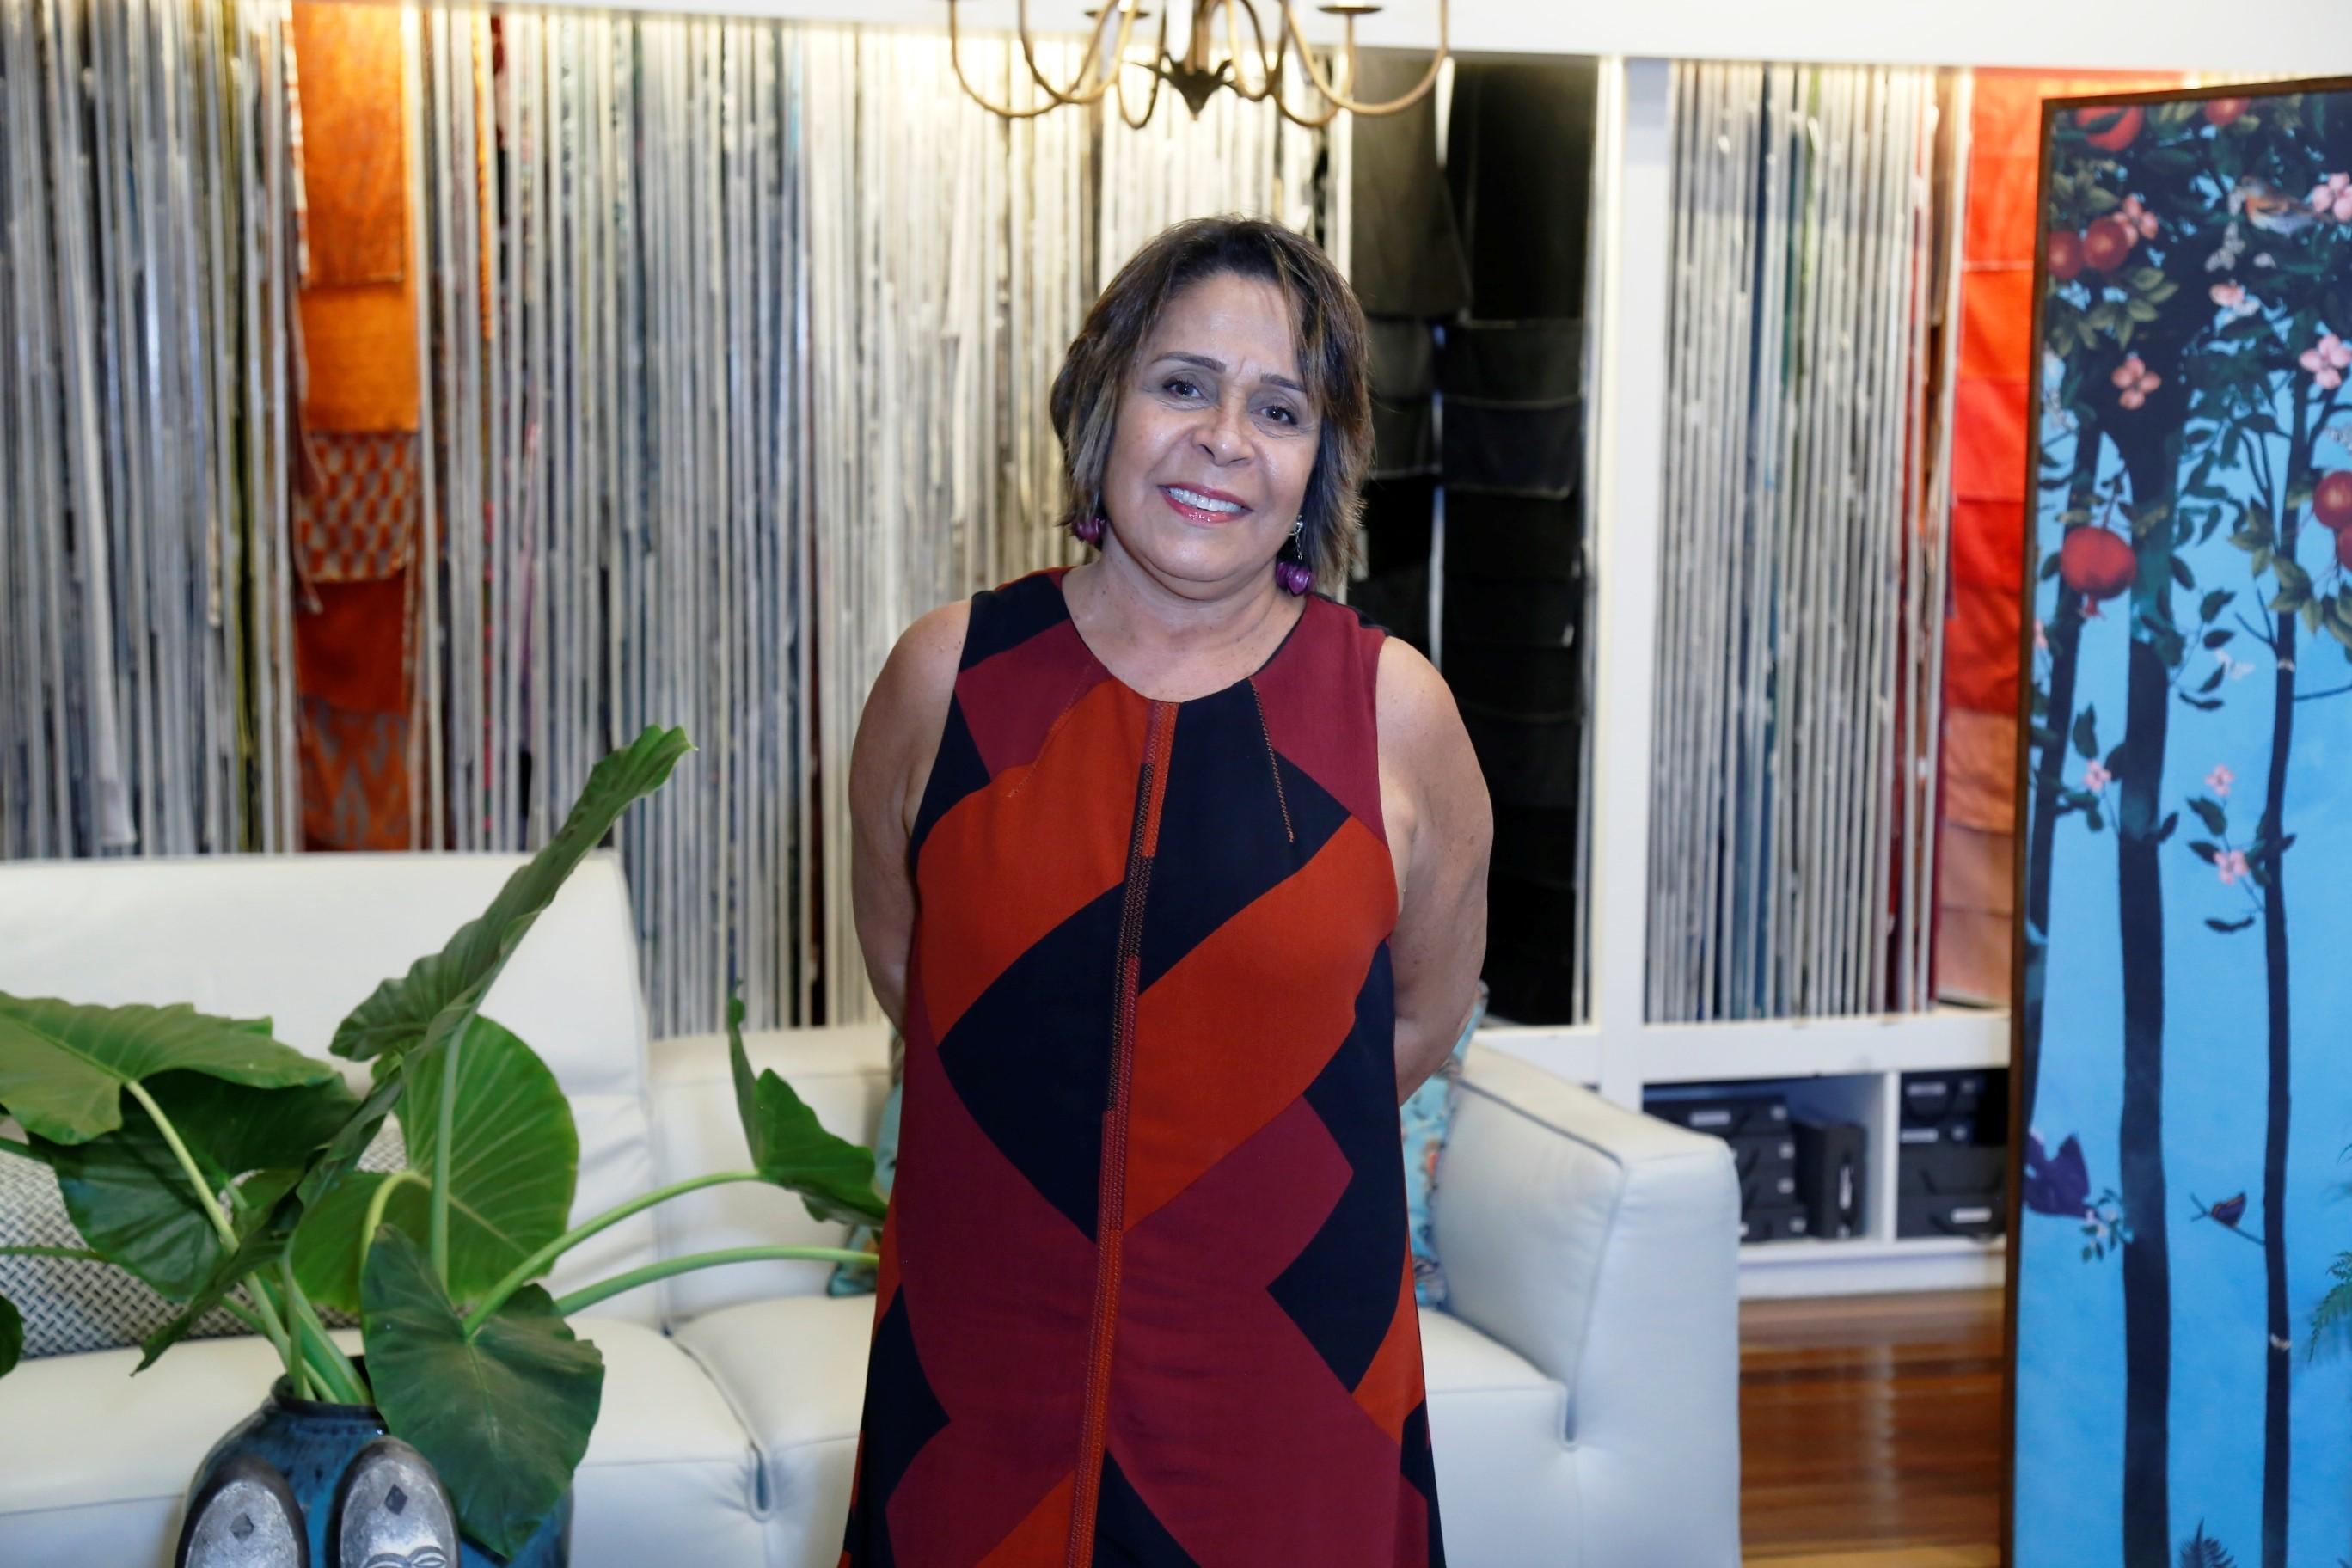 Cristina Johnson